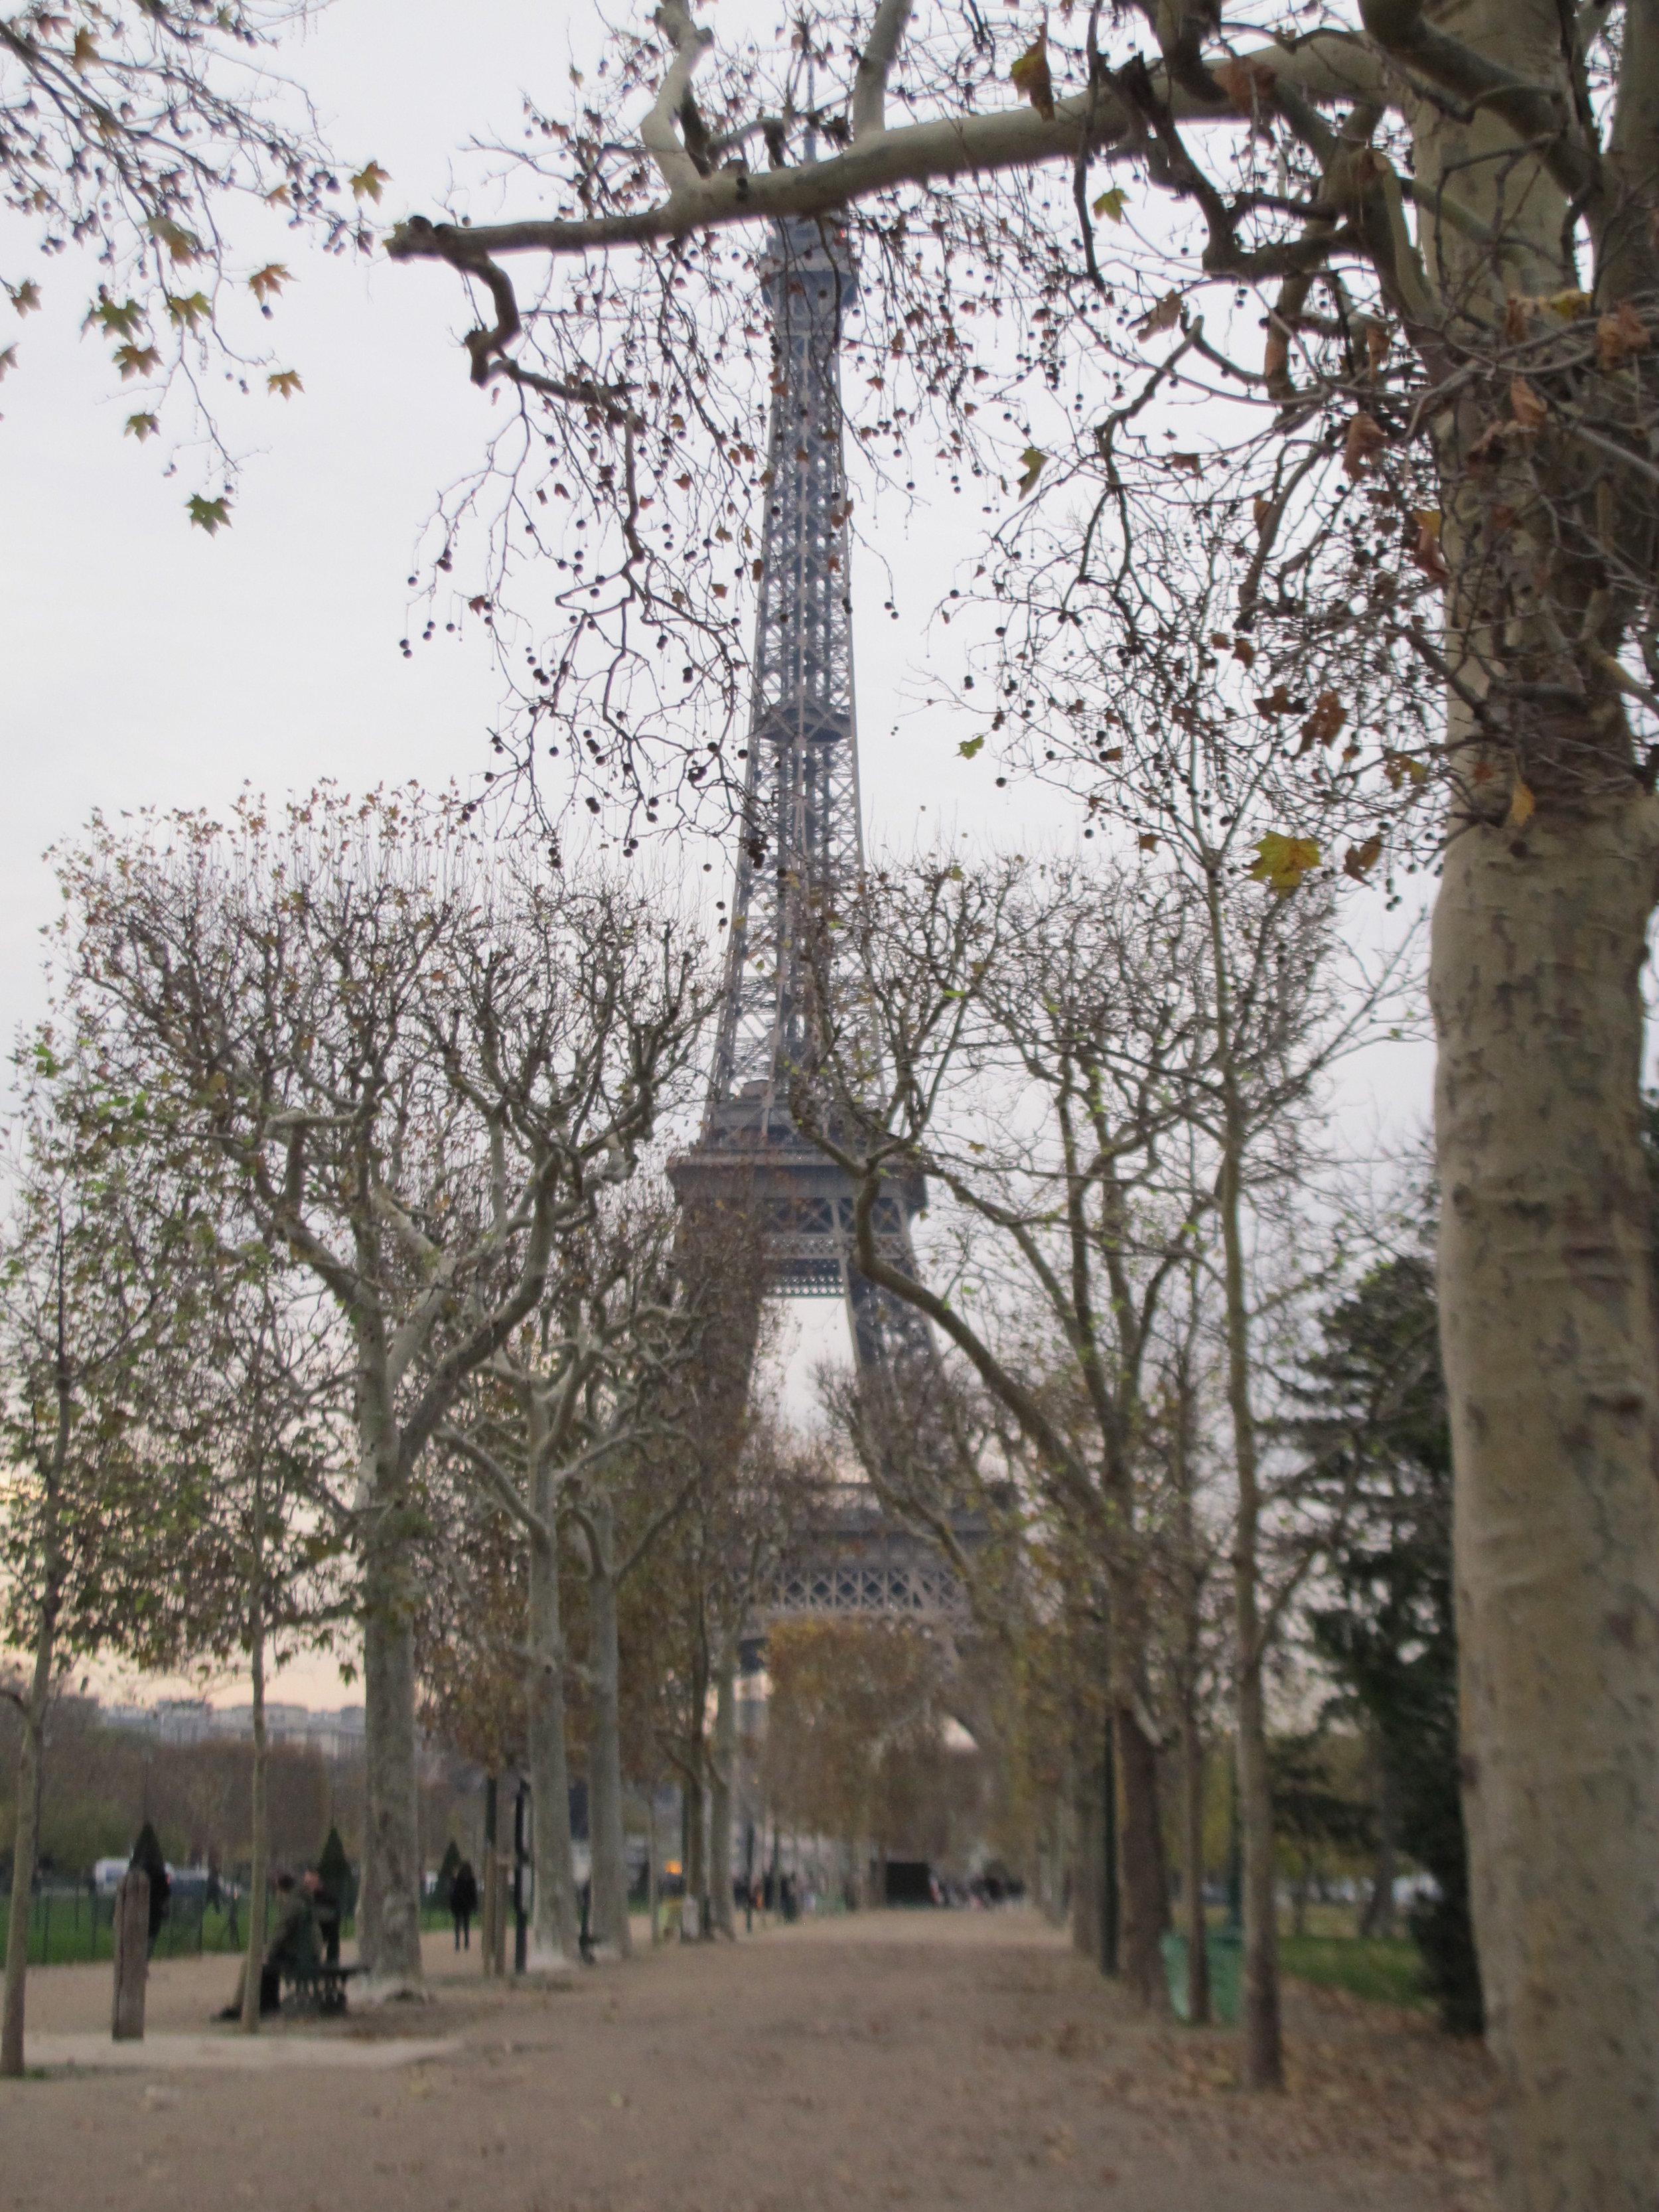 Eifel Tower Paris 2012 1.JPG